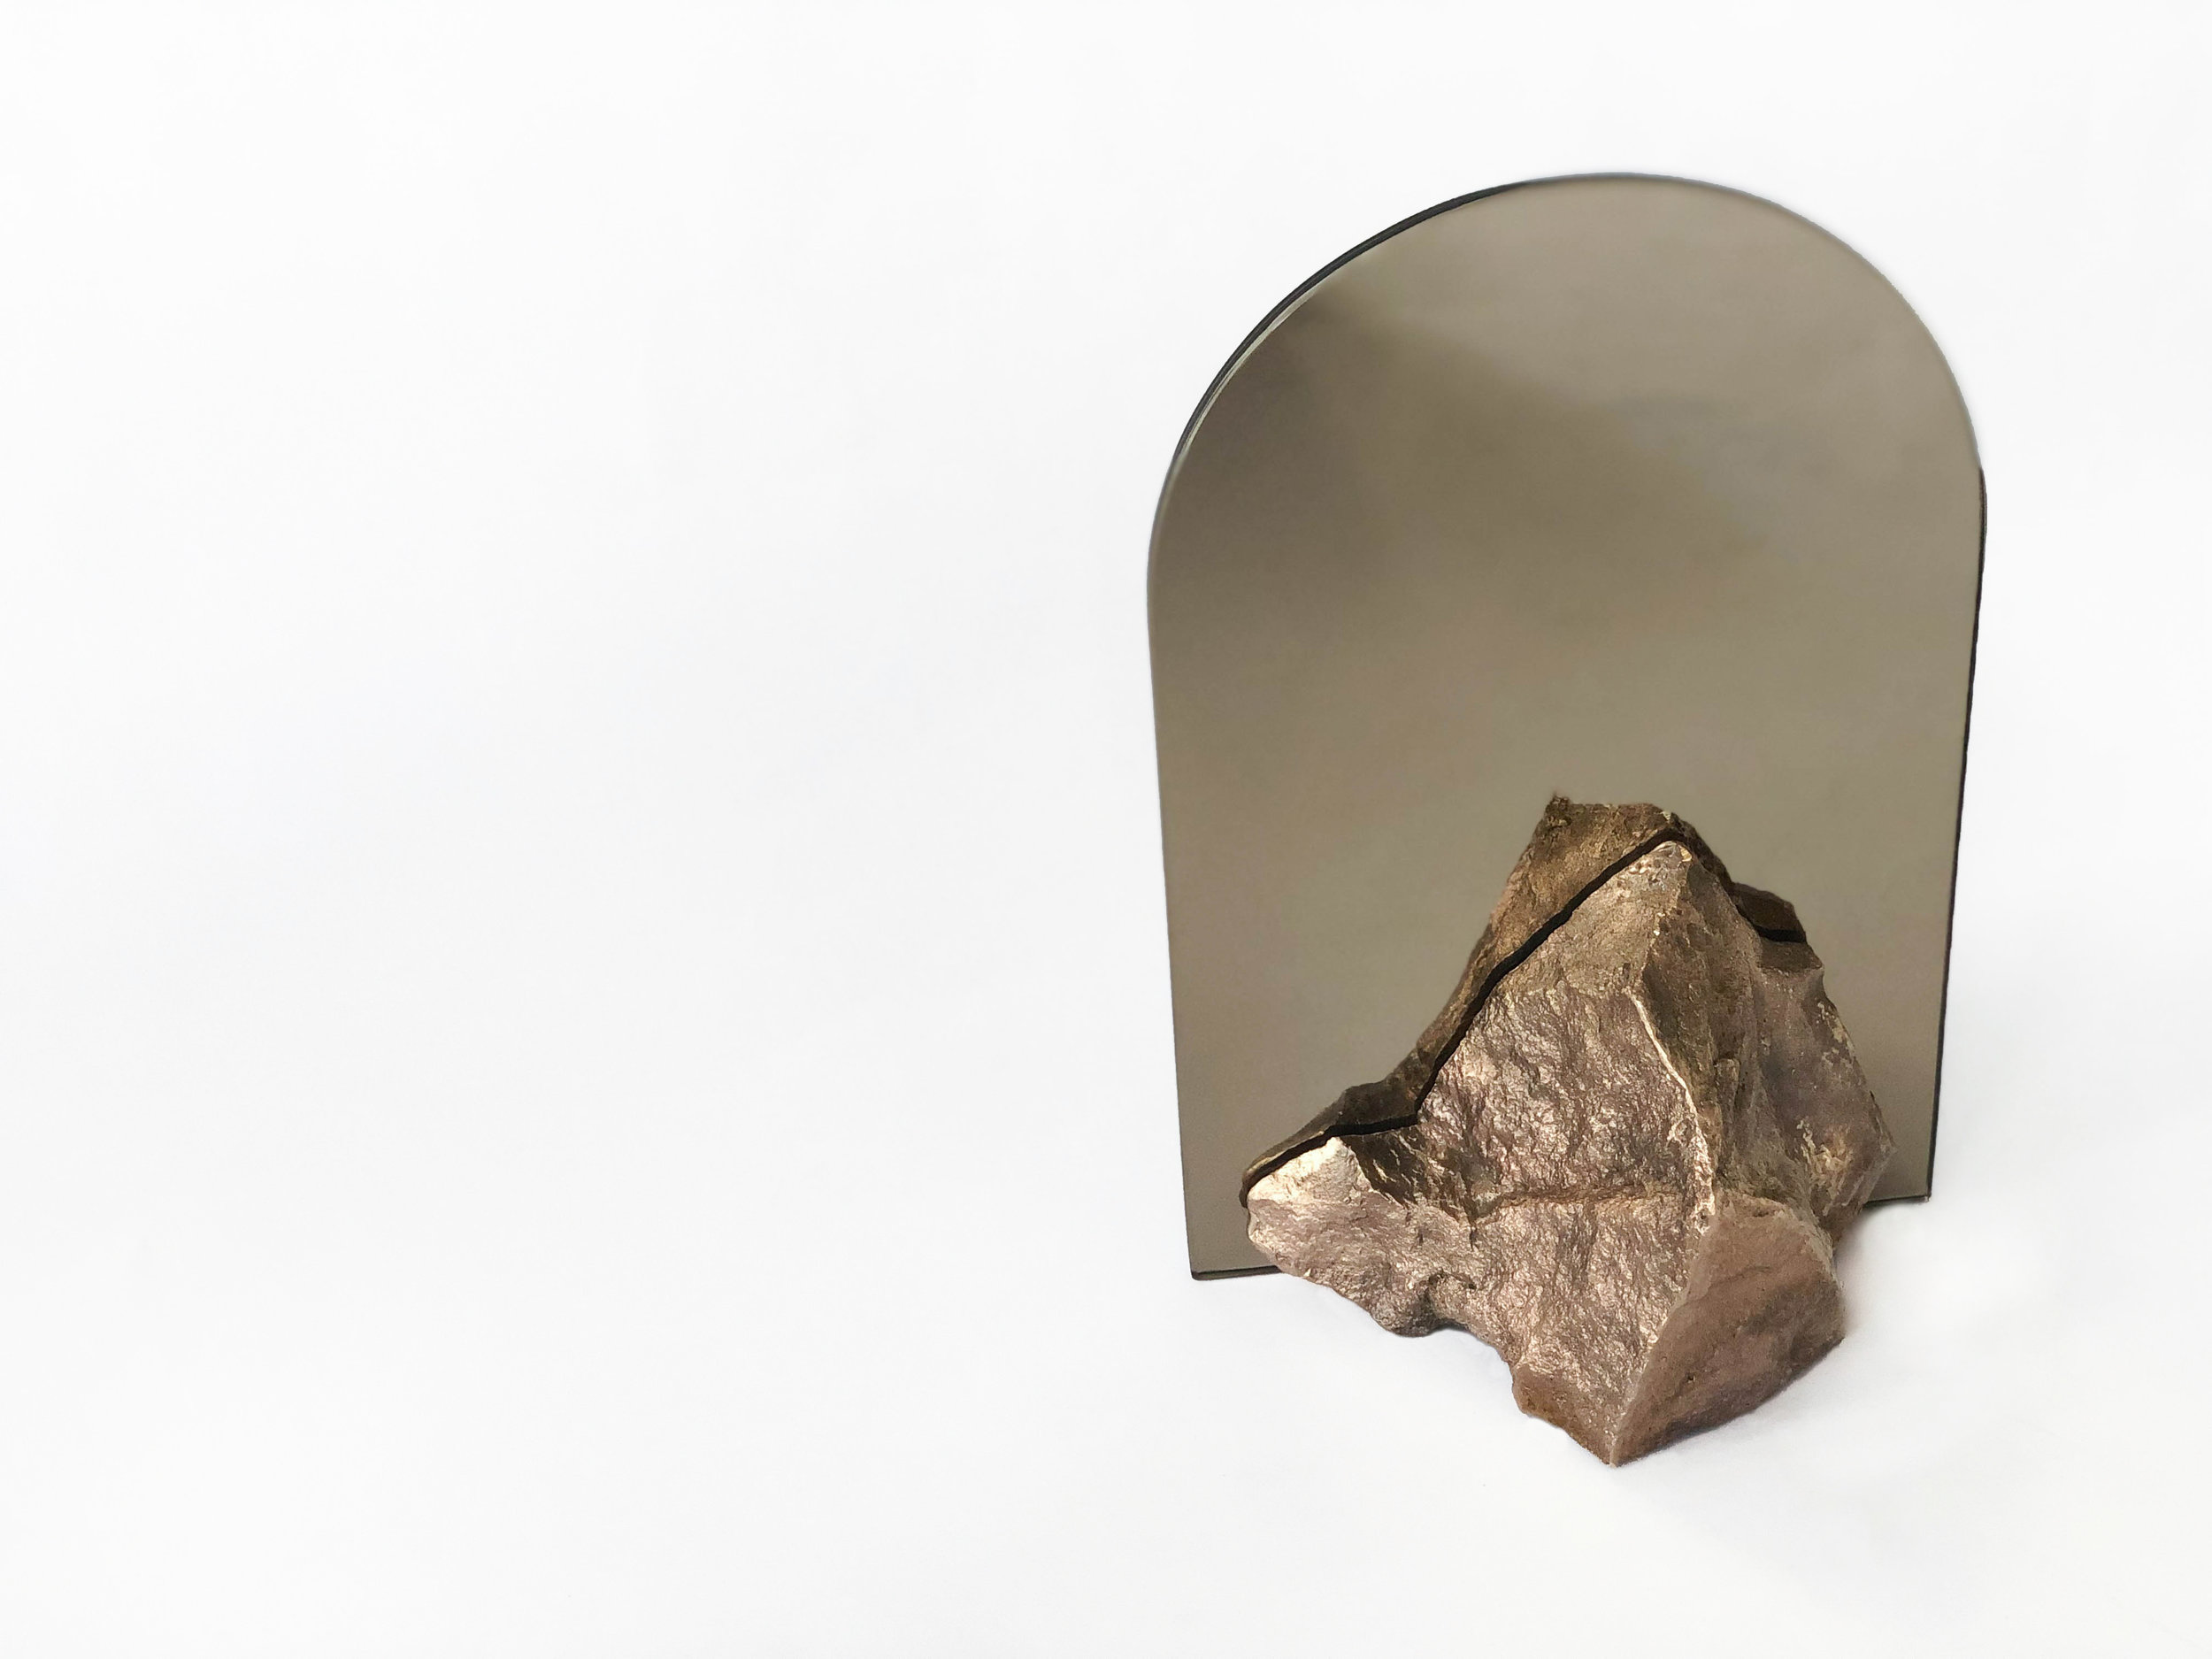 mirror_bronze 10.1.jpg